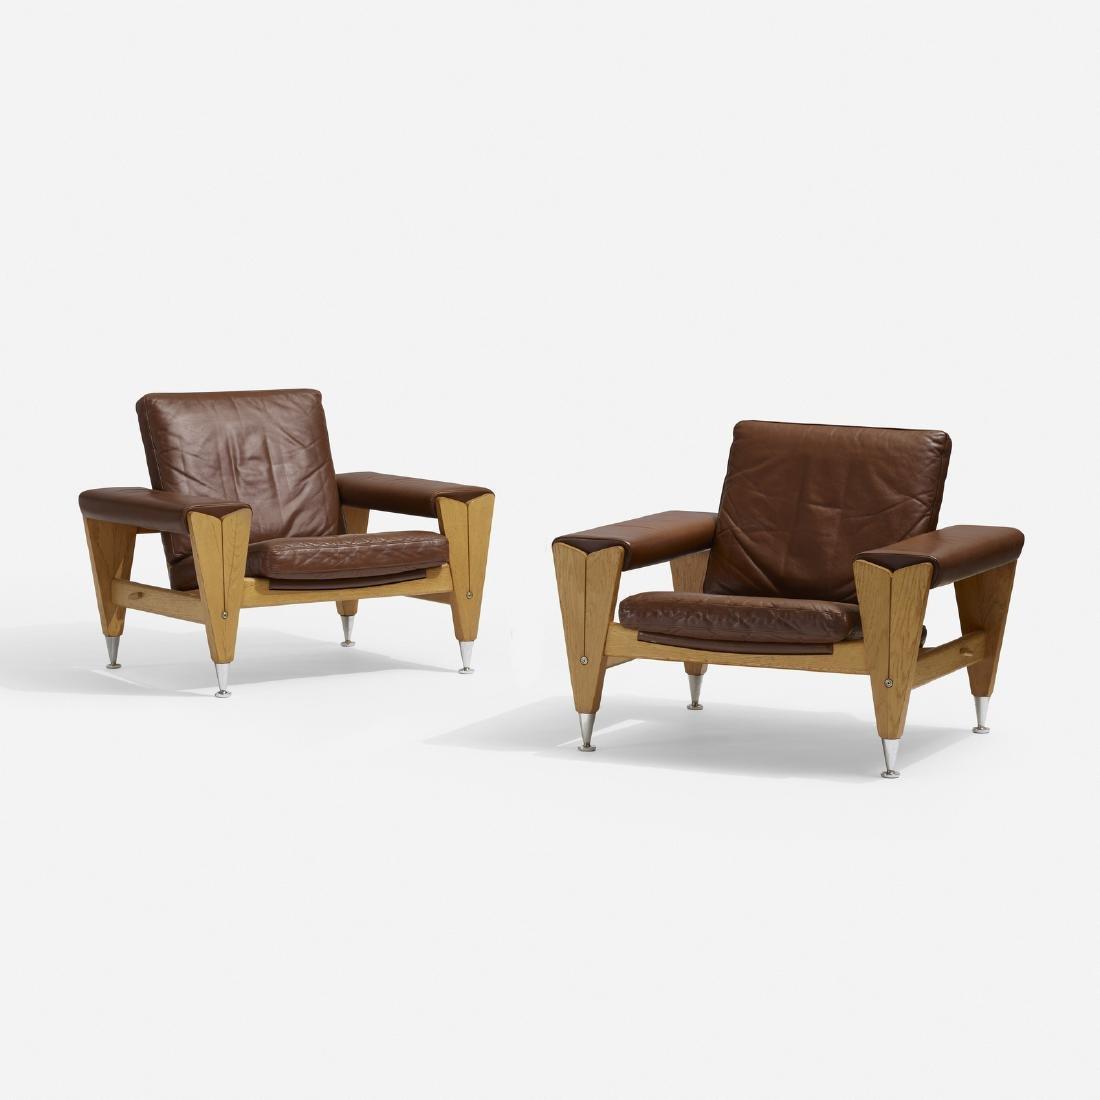 Hans J. Wegner, lounge chairs, pair